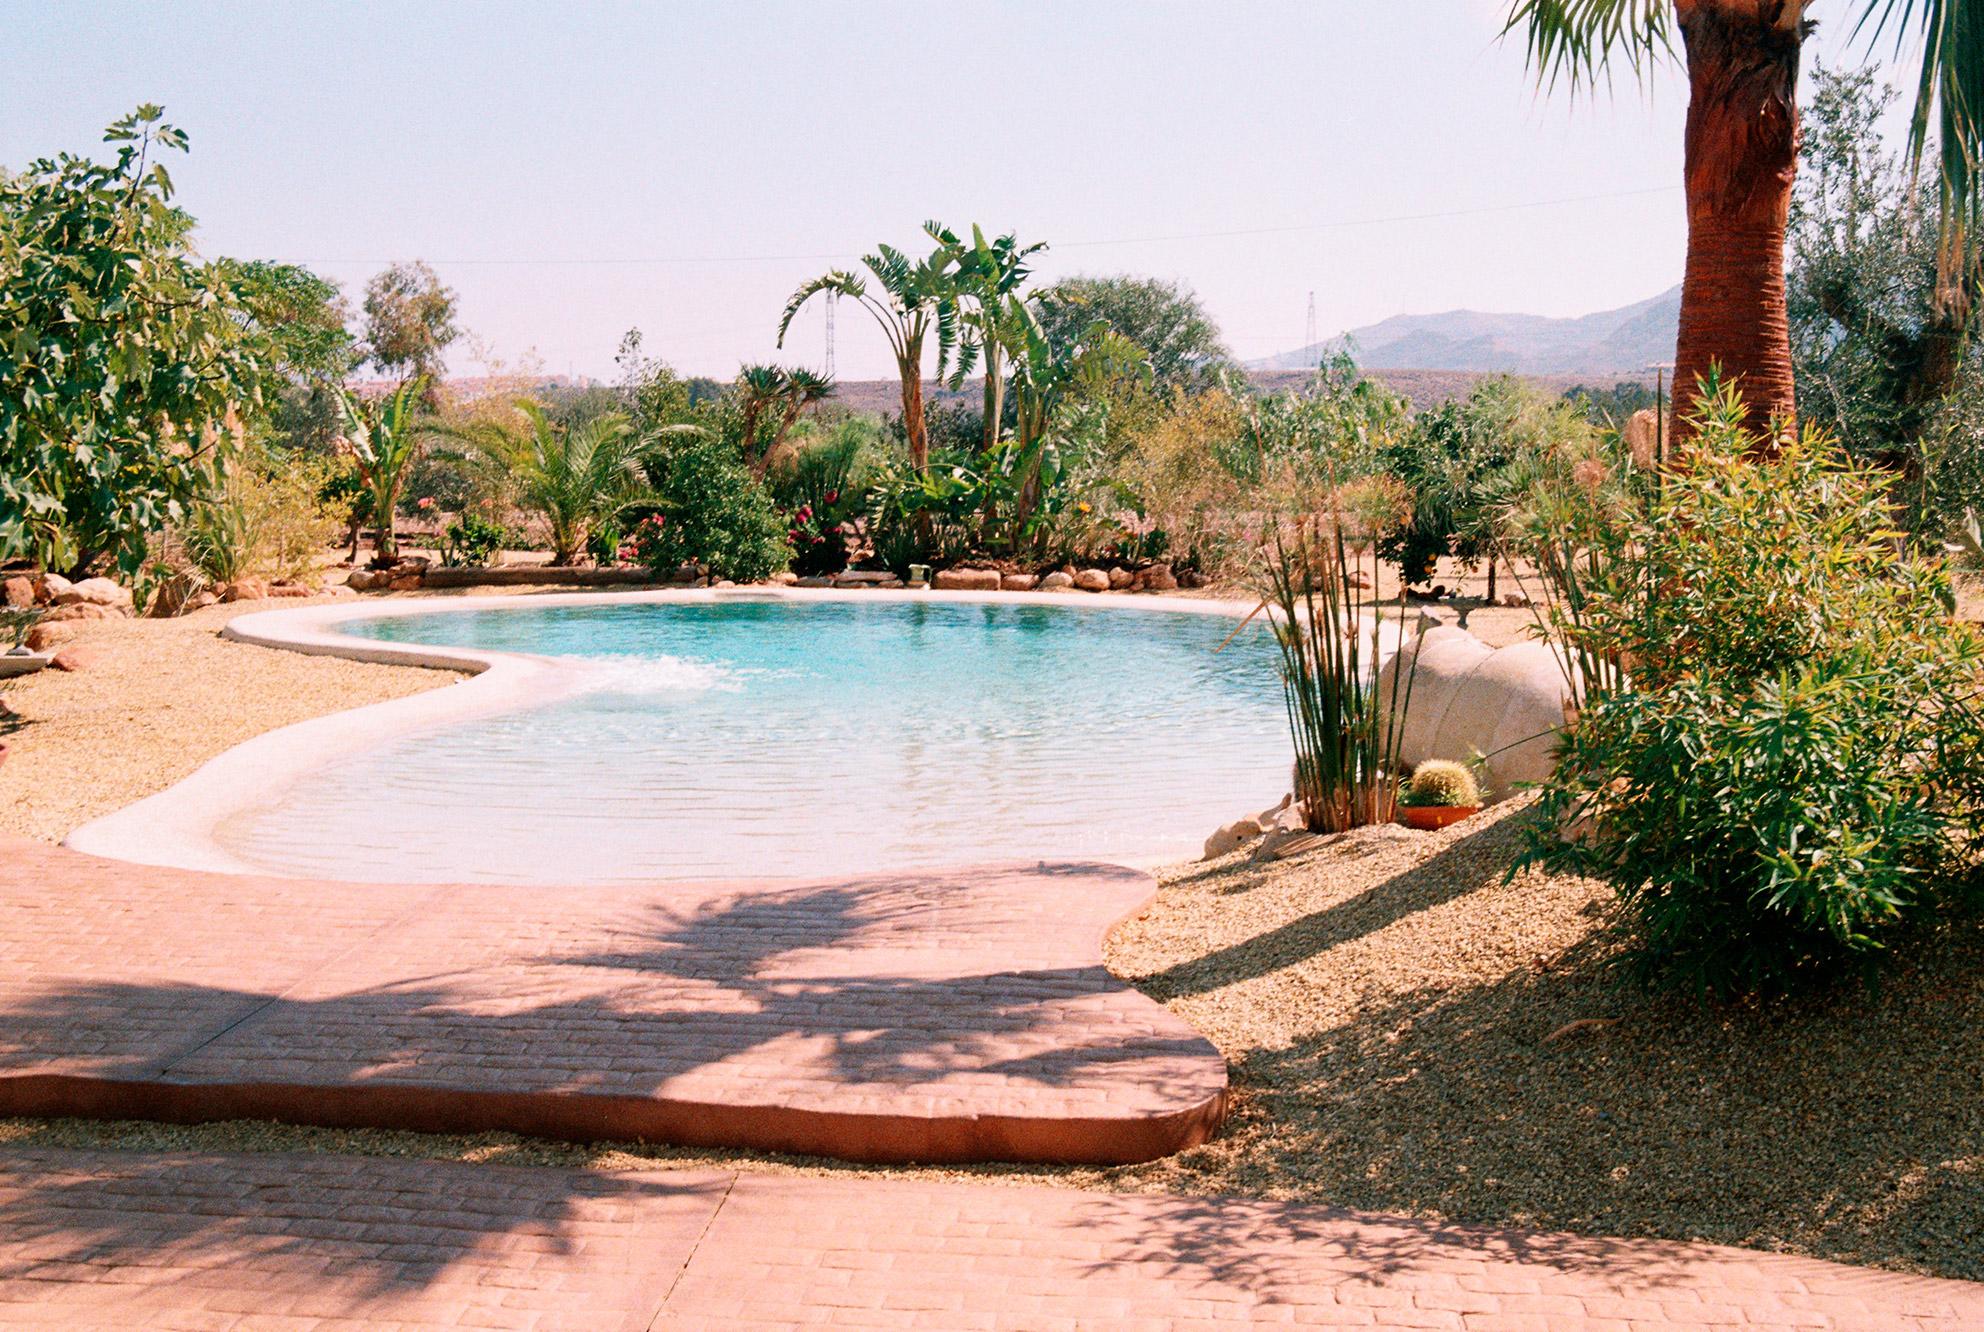 Construcci n de piscinas en m laga infinitas formas for Piscina inacua malaga